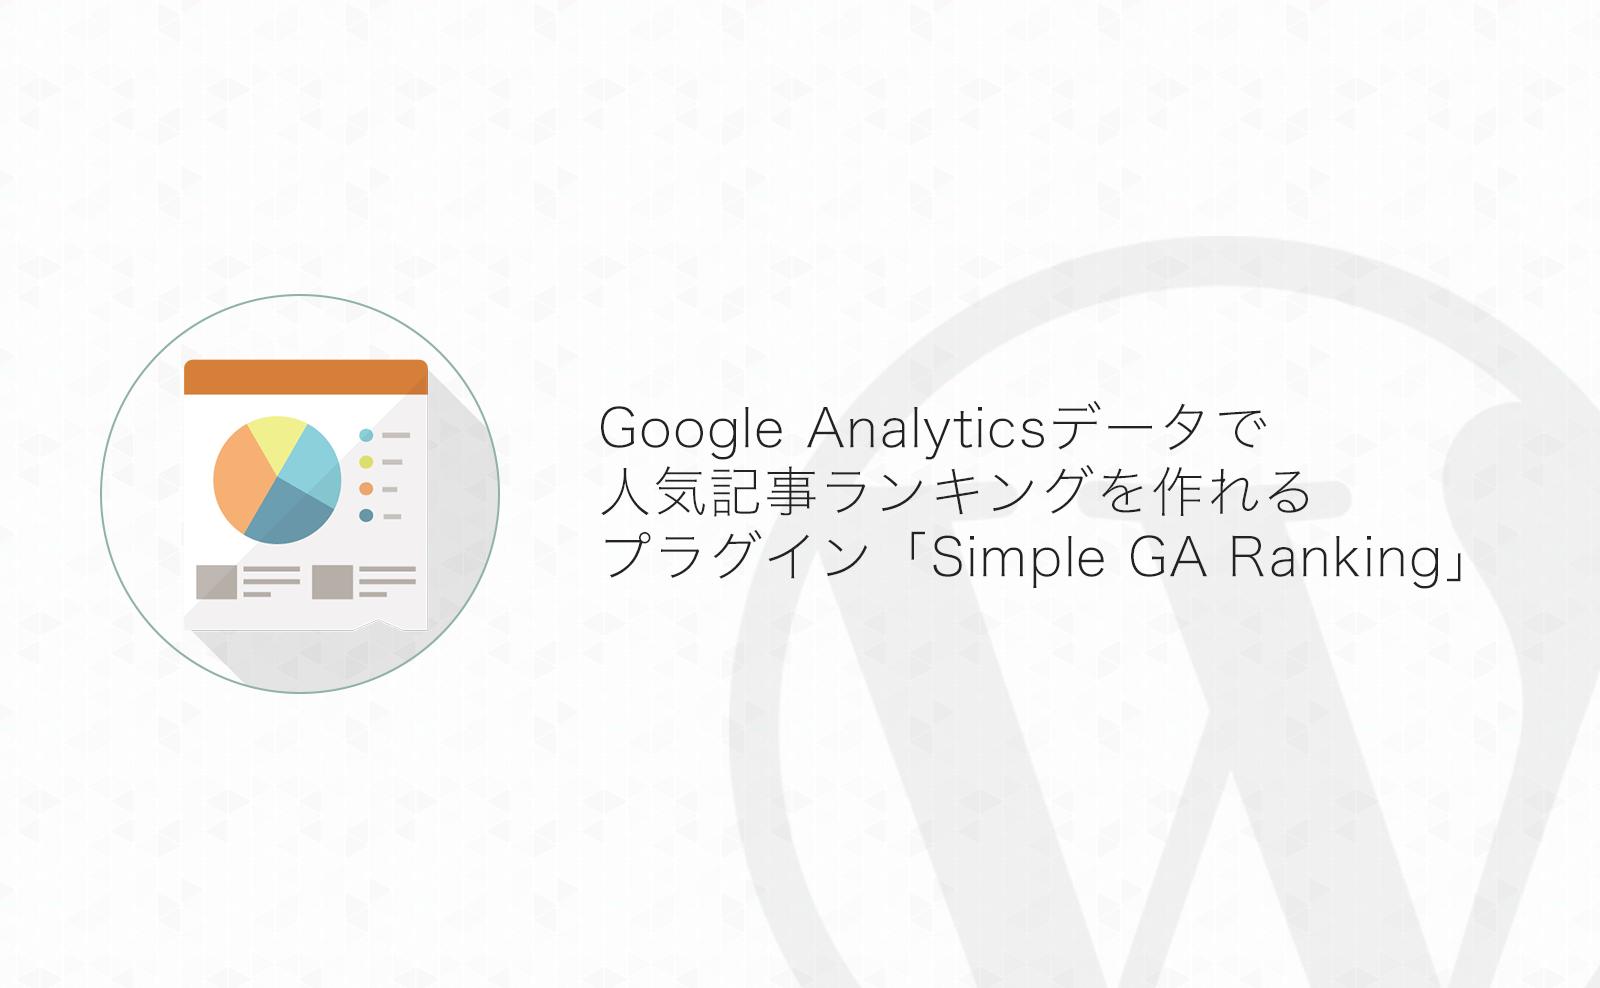 【WordPress】Google Analyticsのデータで人気記事ランキングを作れるプラグイン「Simple GA Ranking」が軽くてよさげ